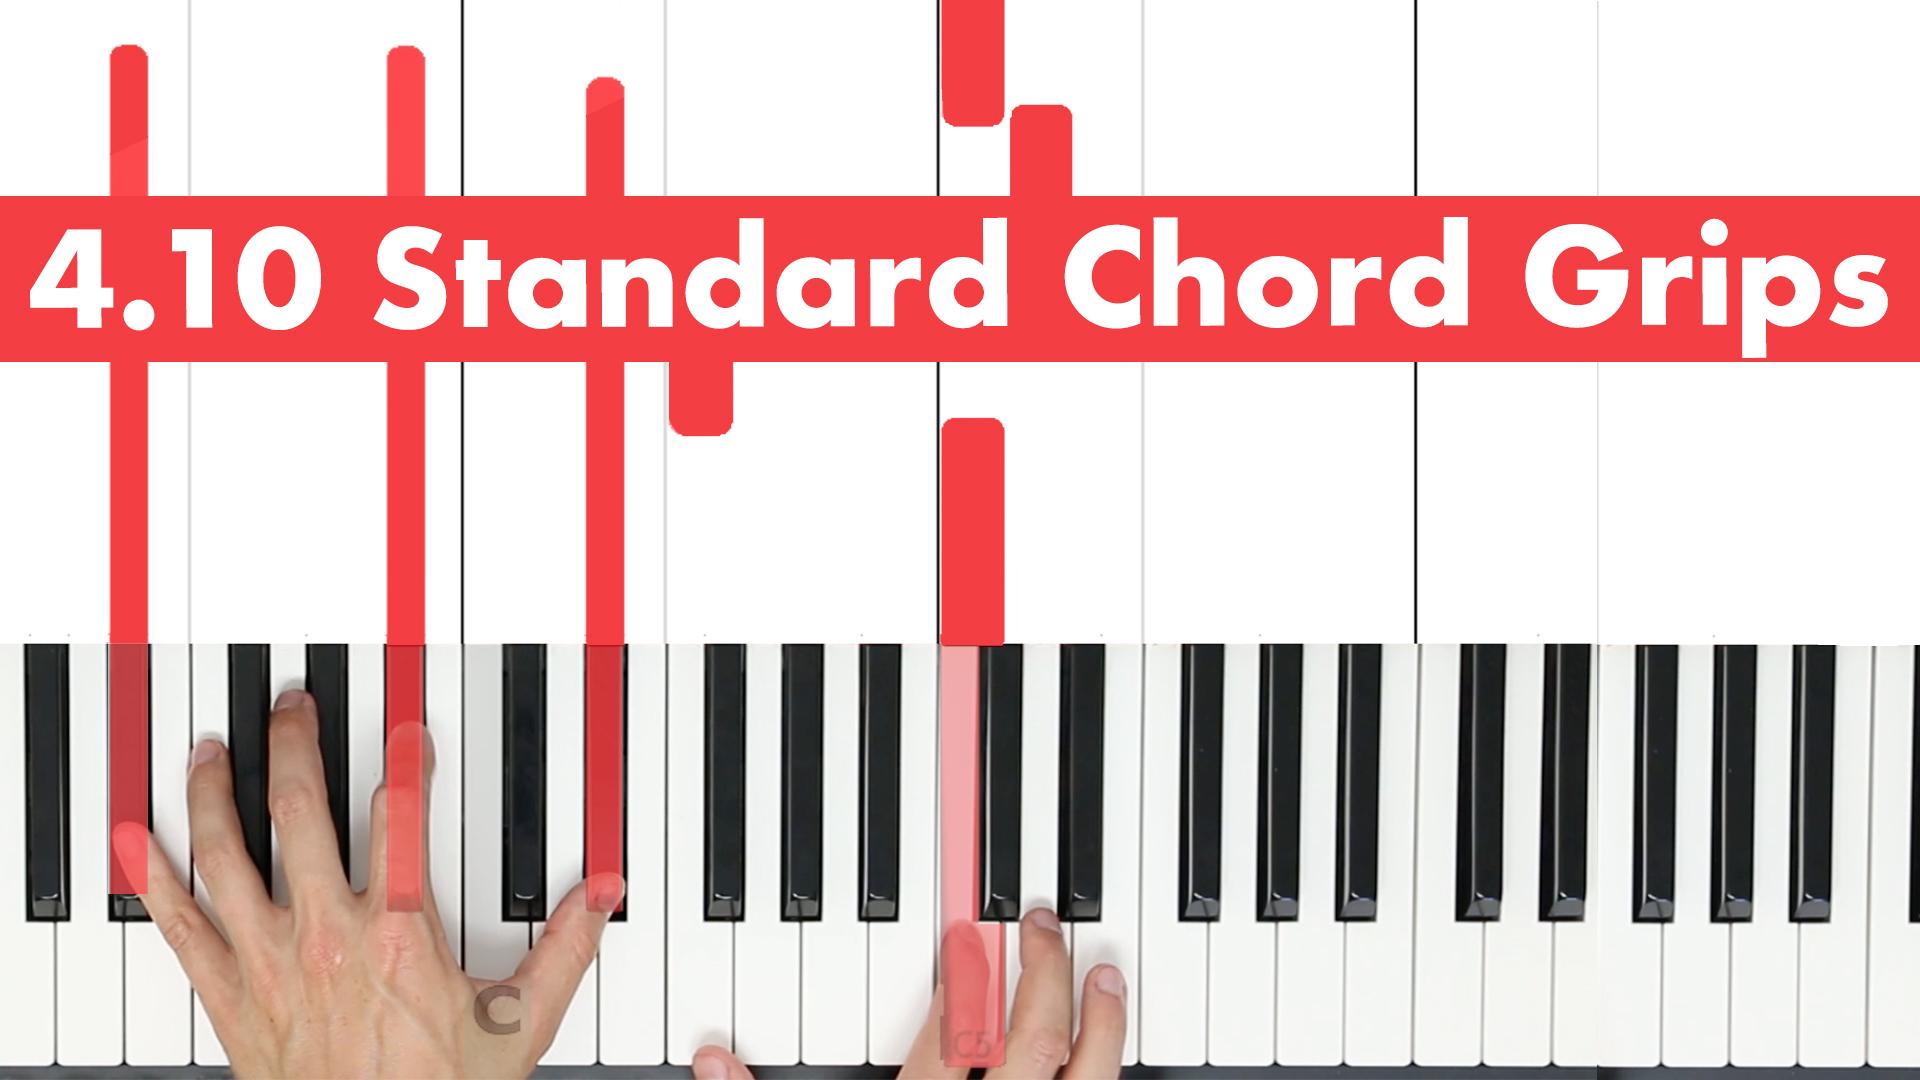 4.10 Standard Chord Grips